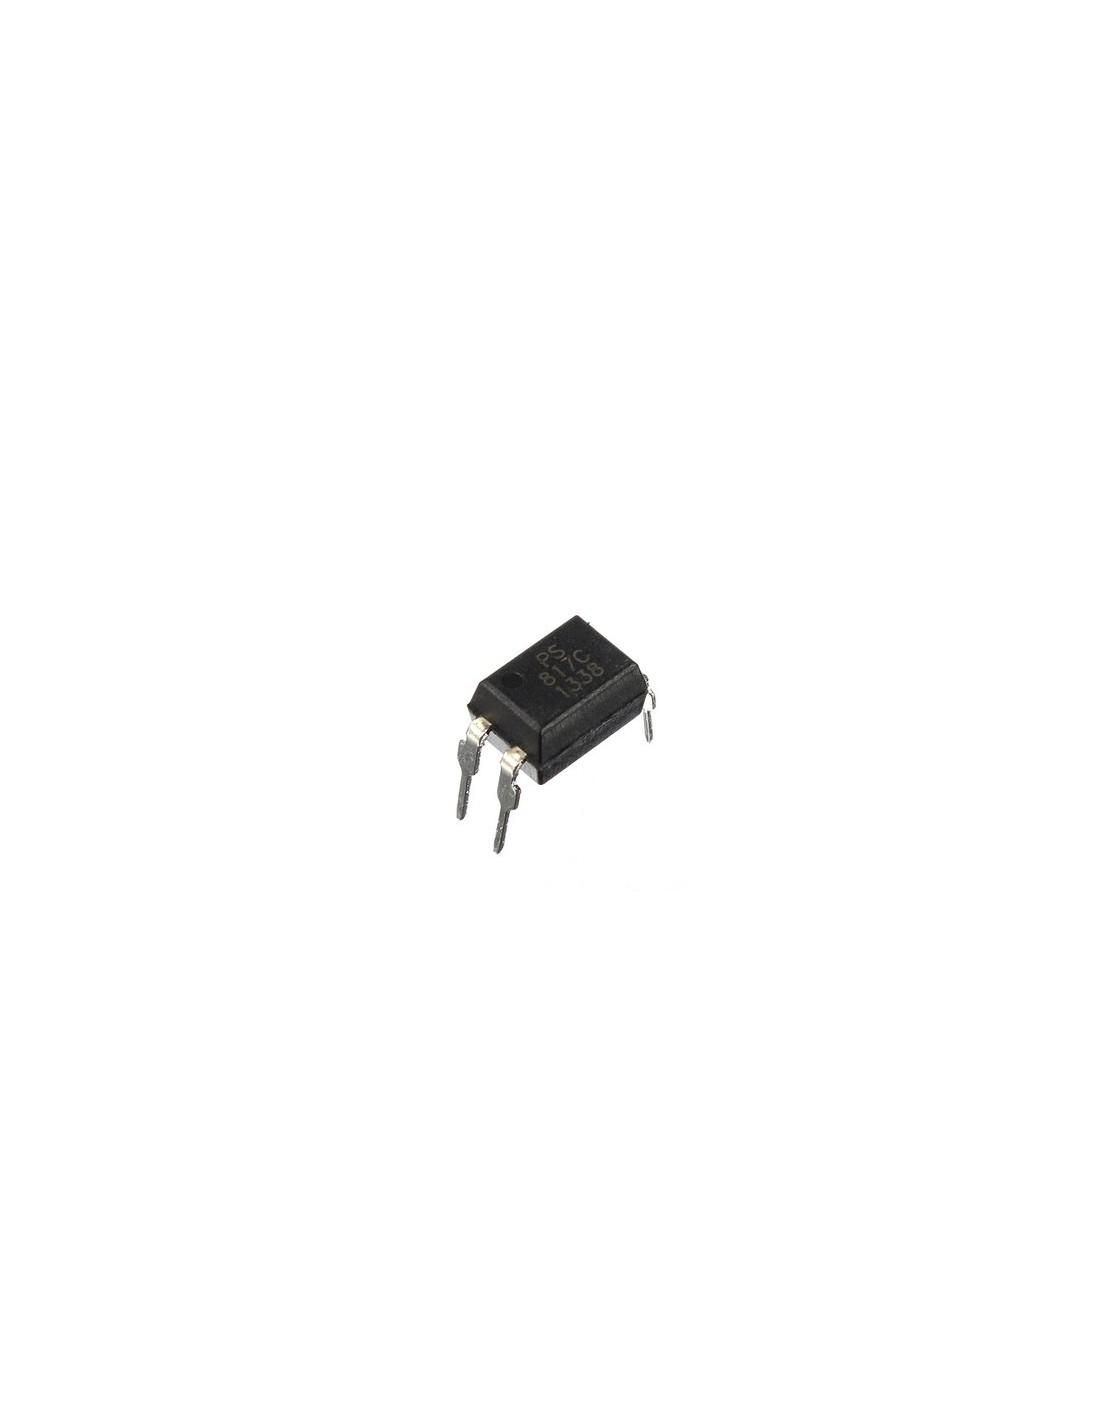 Pc817 4 Pin Opto Coupler Phototransistor Photocoupler Isolator Circuit Tap To Zoom